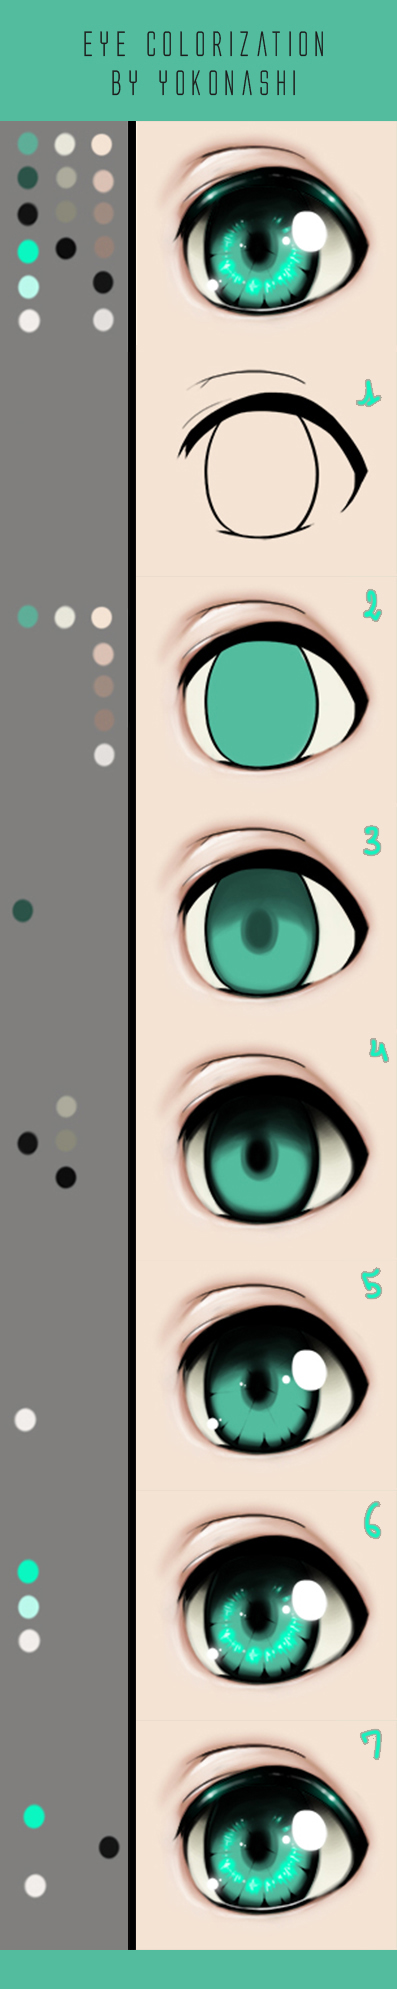 Eye colorization tutorial